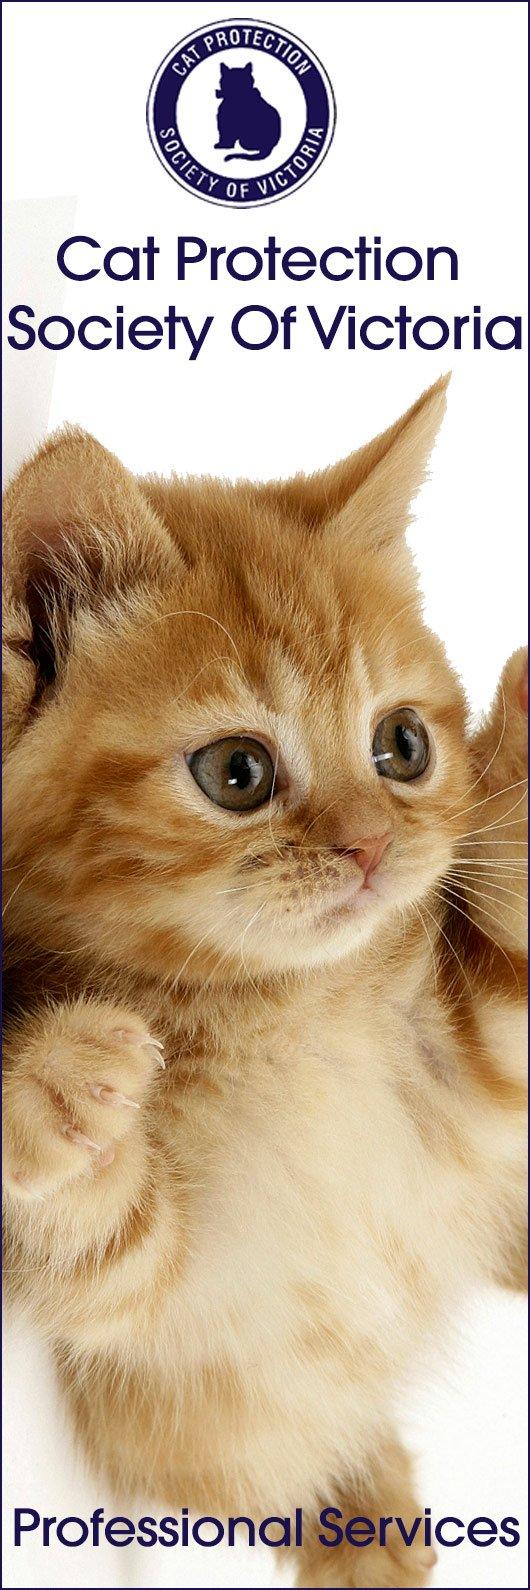 Greensborough Cat Protection